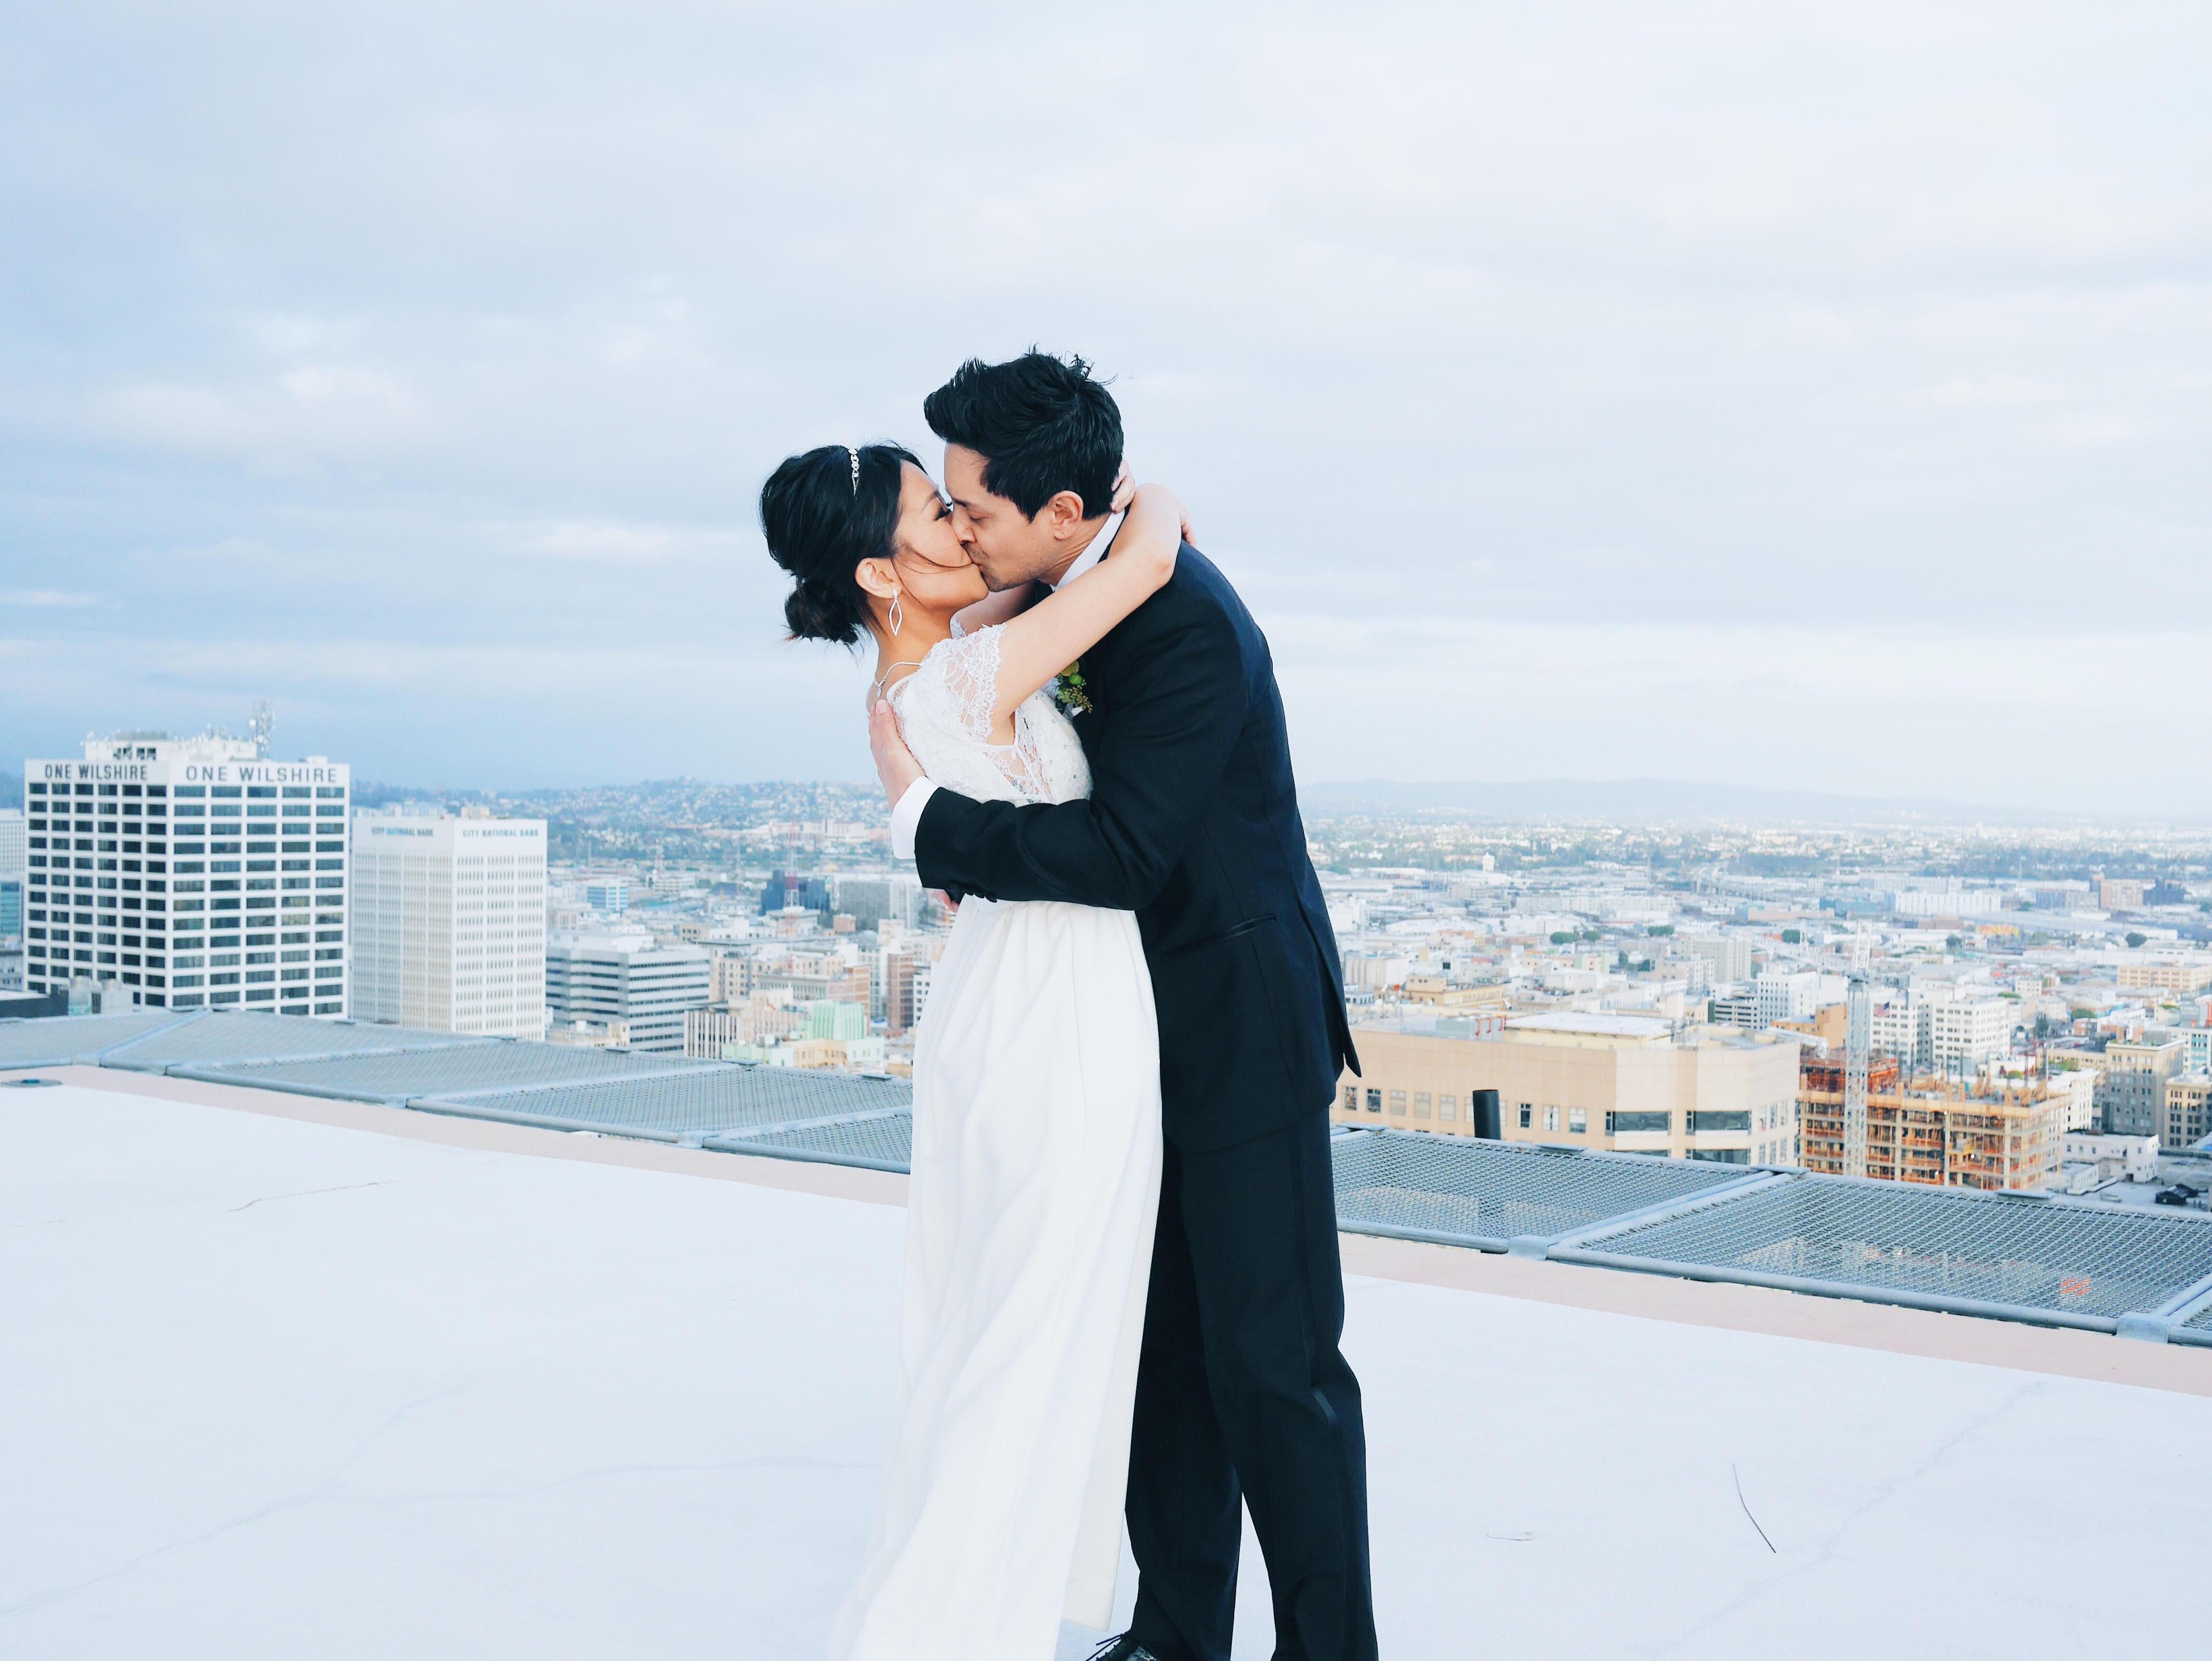 dtla elopement, elopement, bhldn wedding dress, jenny yoo, downtown la wedding